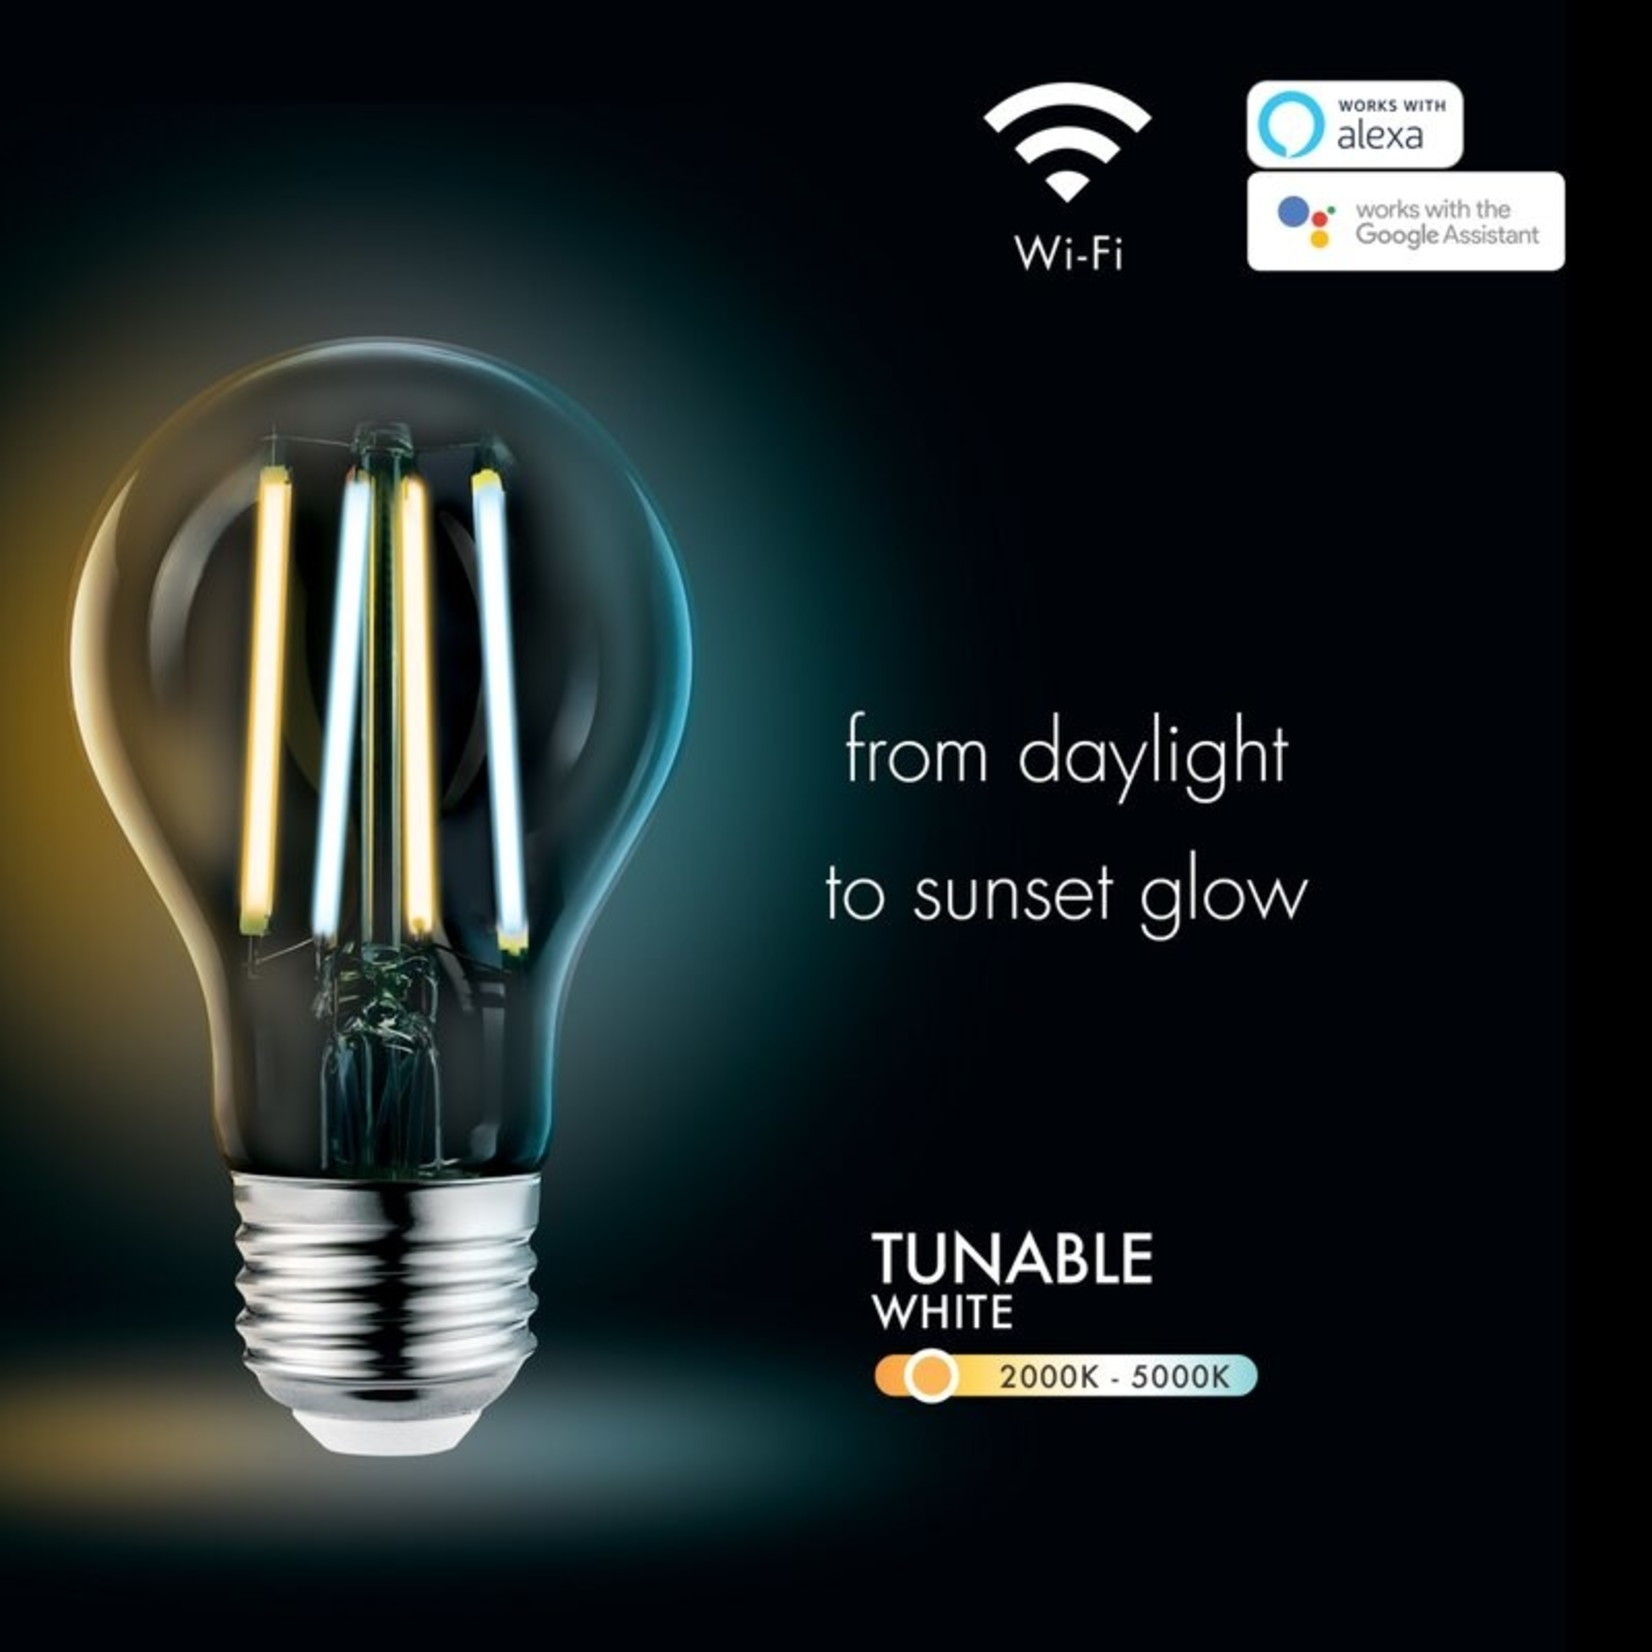 *8.5 Watt (60 Watt Equivalent), A19 LED Smart, Dimmable Light Bulb, Warm White (5000K) E26/Medium (Standard) Base